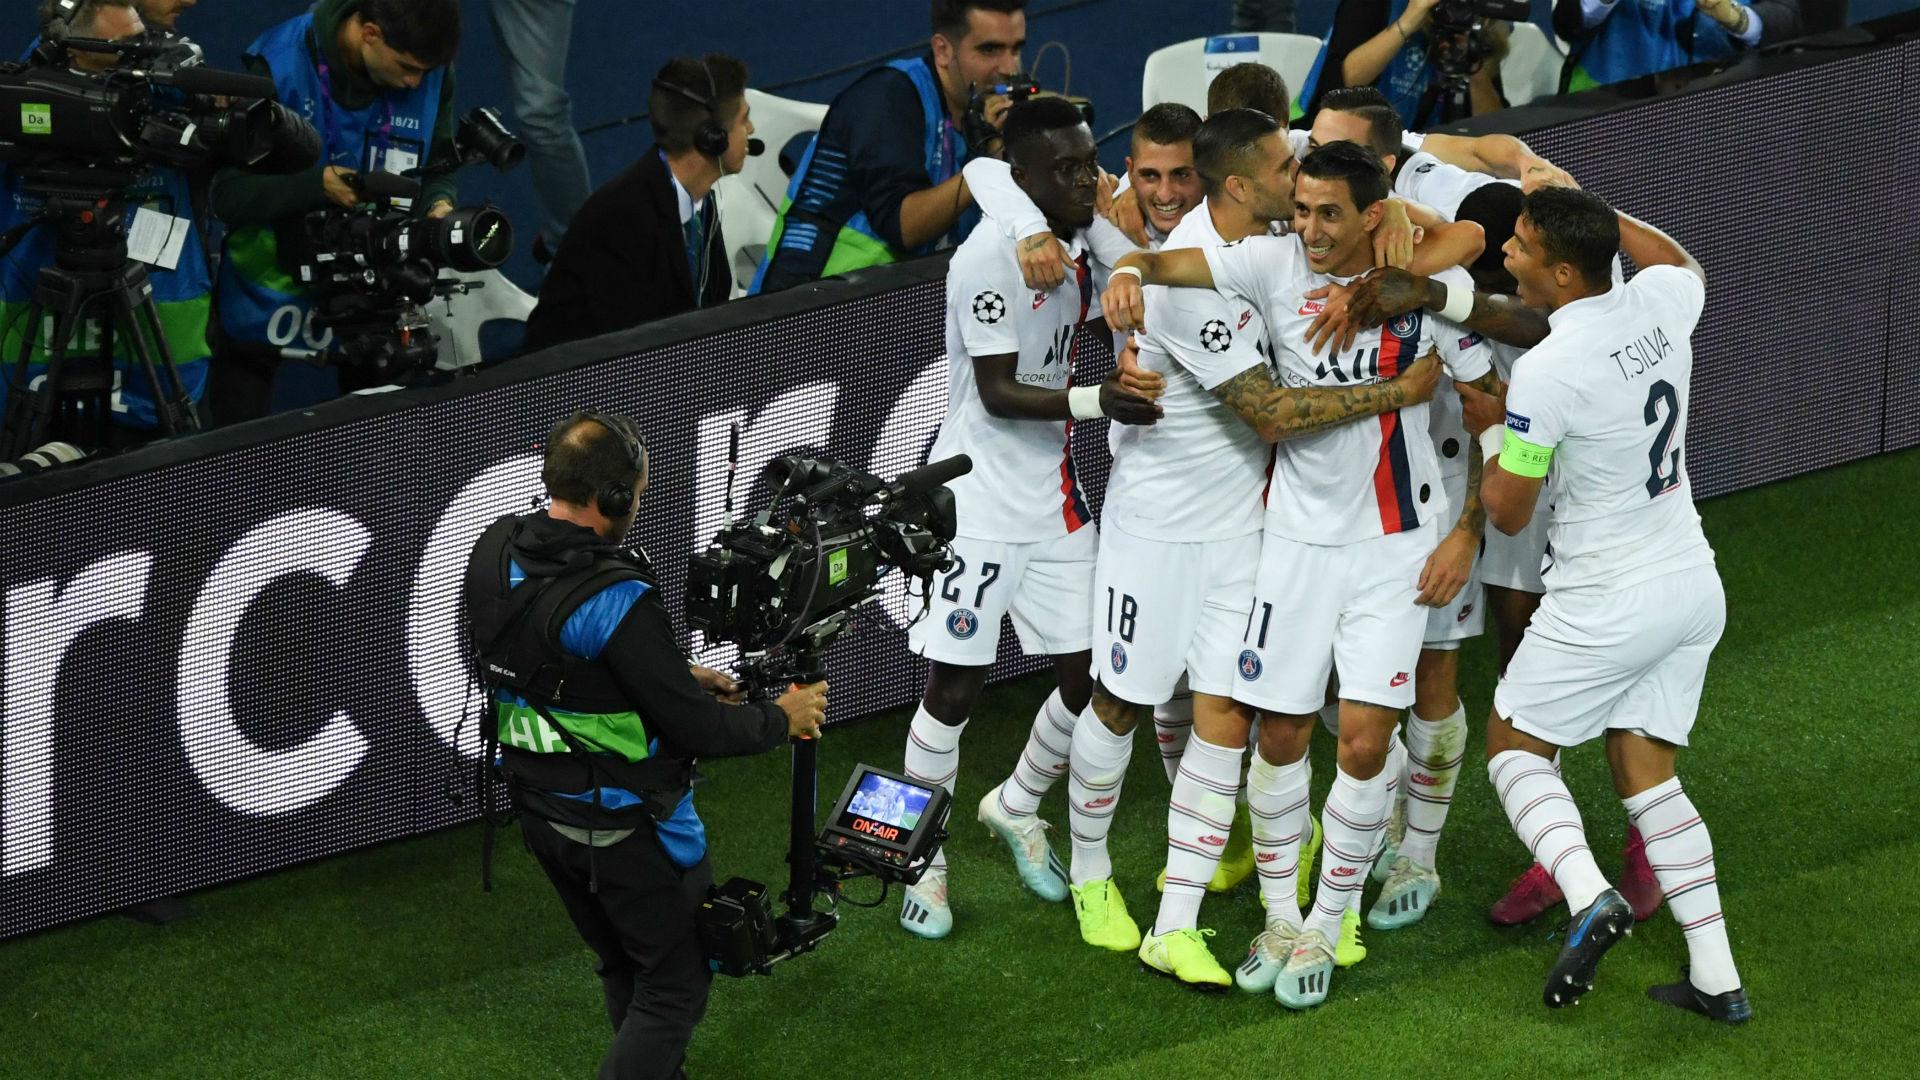 PSG - Real Madrid (3-0), Di Maria et le PSG matent le Real